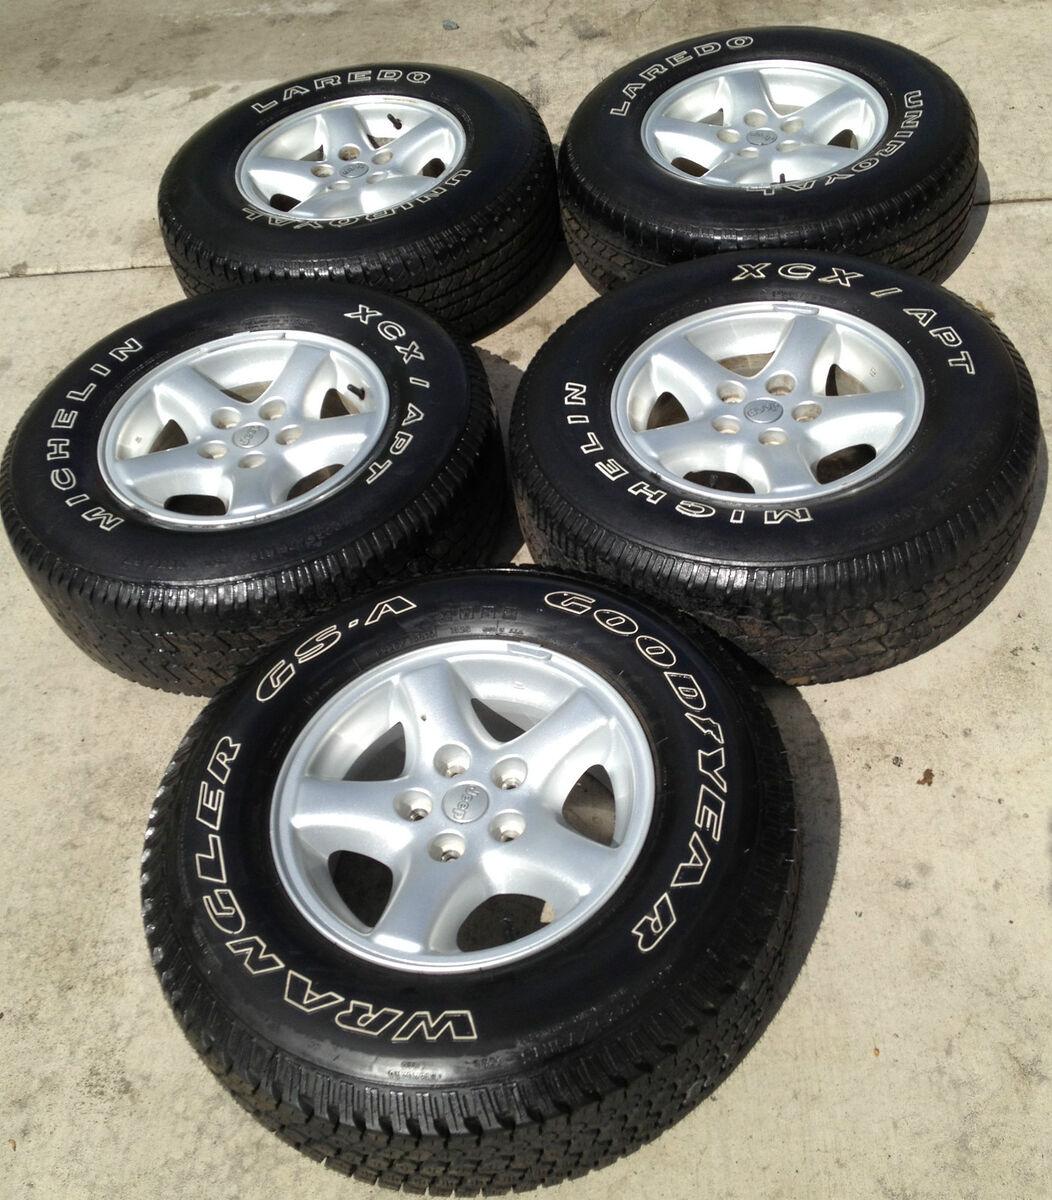 Jeep Wrangler YJ TJ LJ Cherokee XJ ZJ Factory Original Wheels Rims and Tires